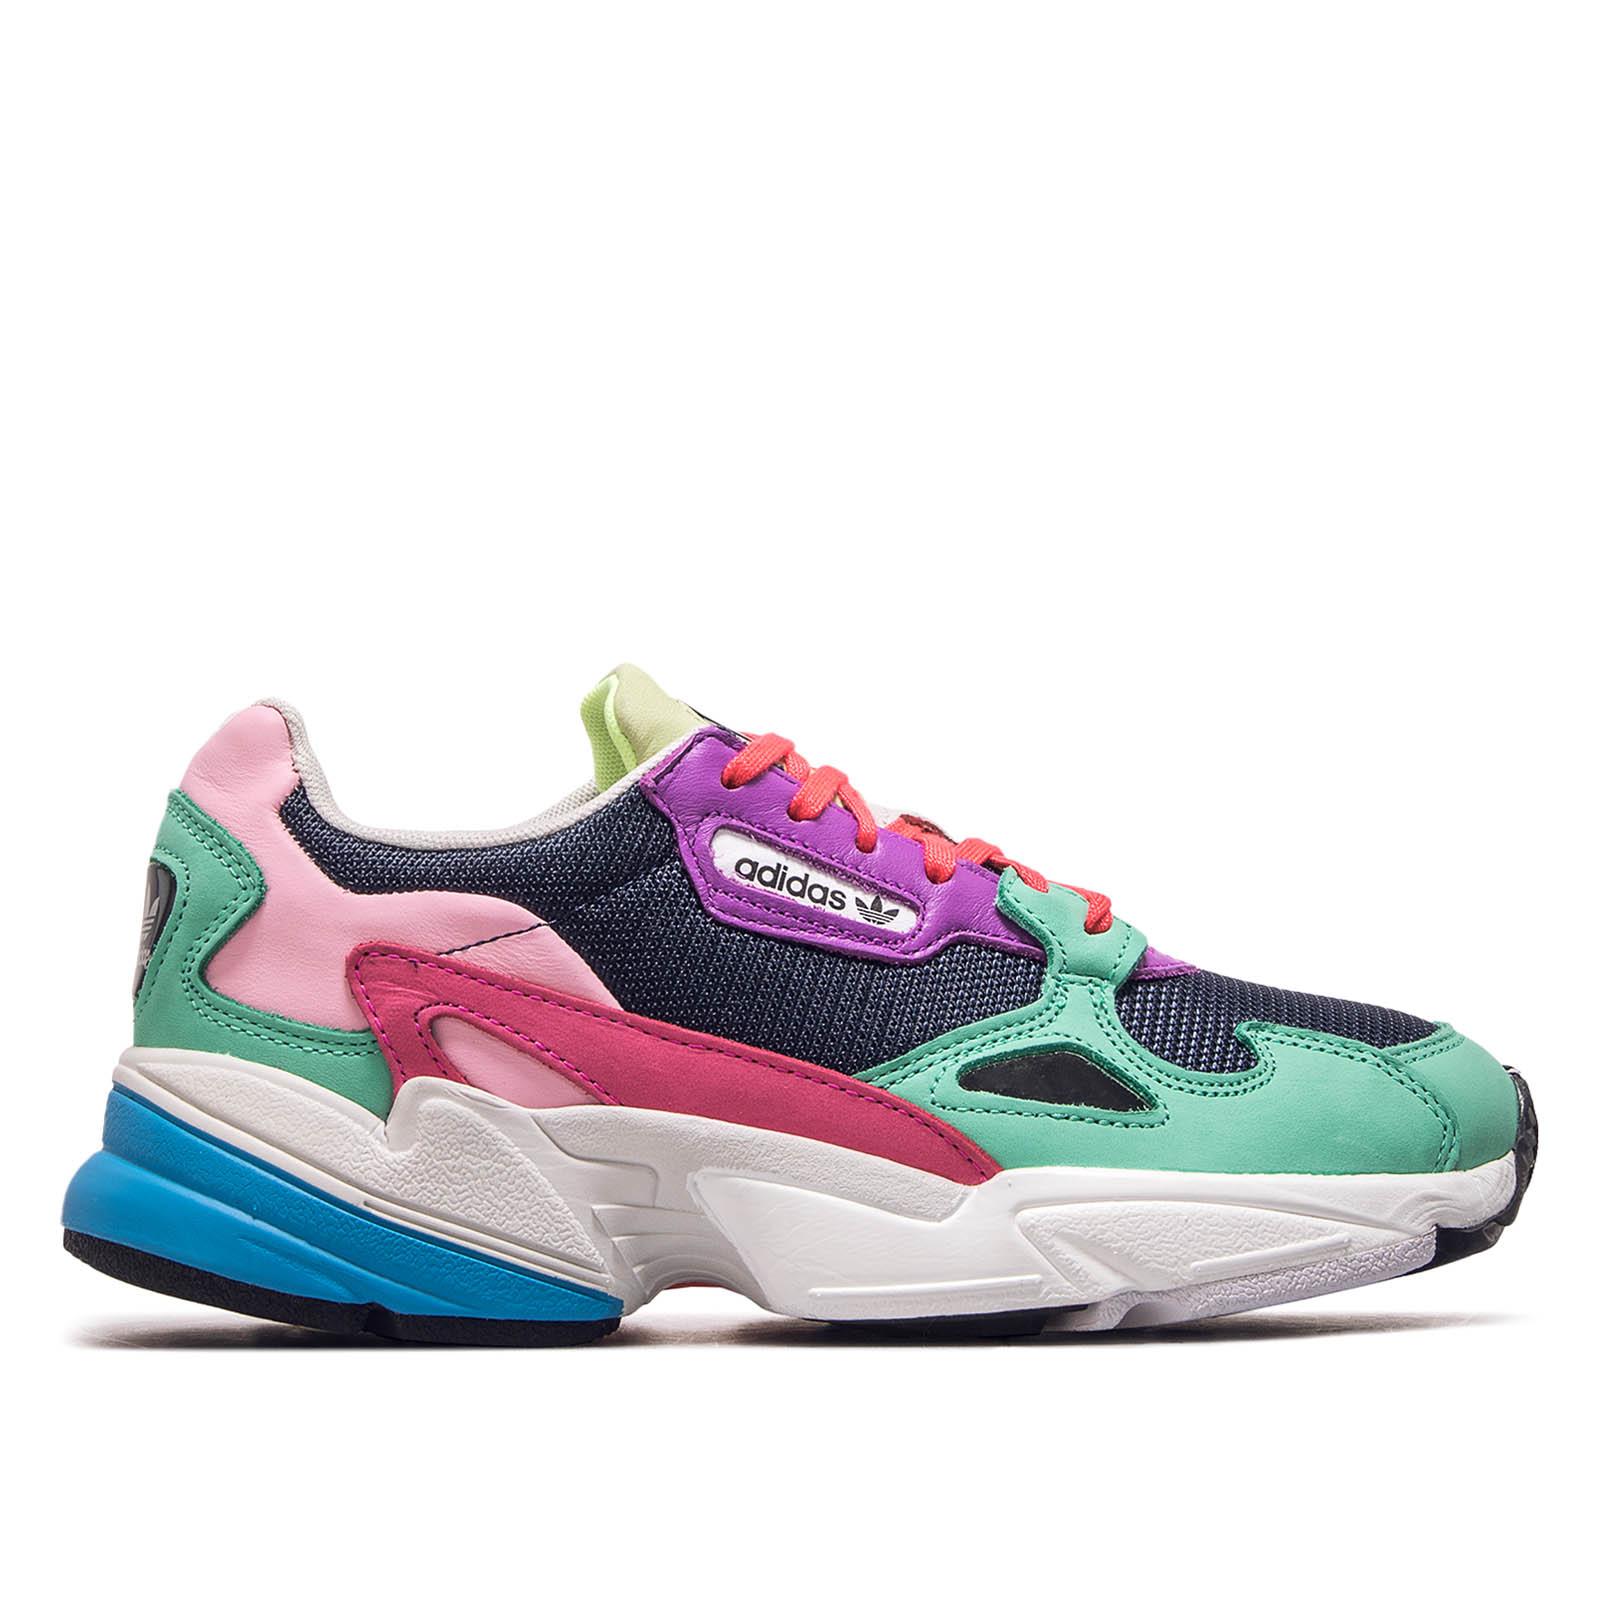 Damen Sneaker von Adidas, Reebok, Puma, Nike u.v.m. online